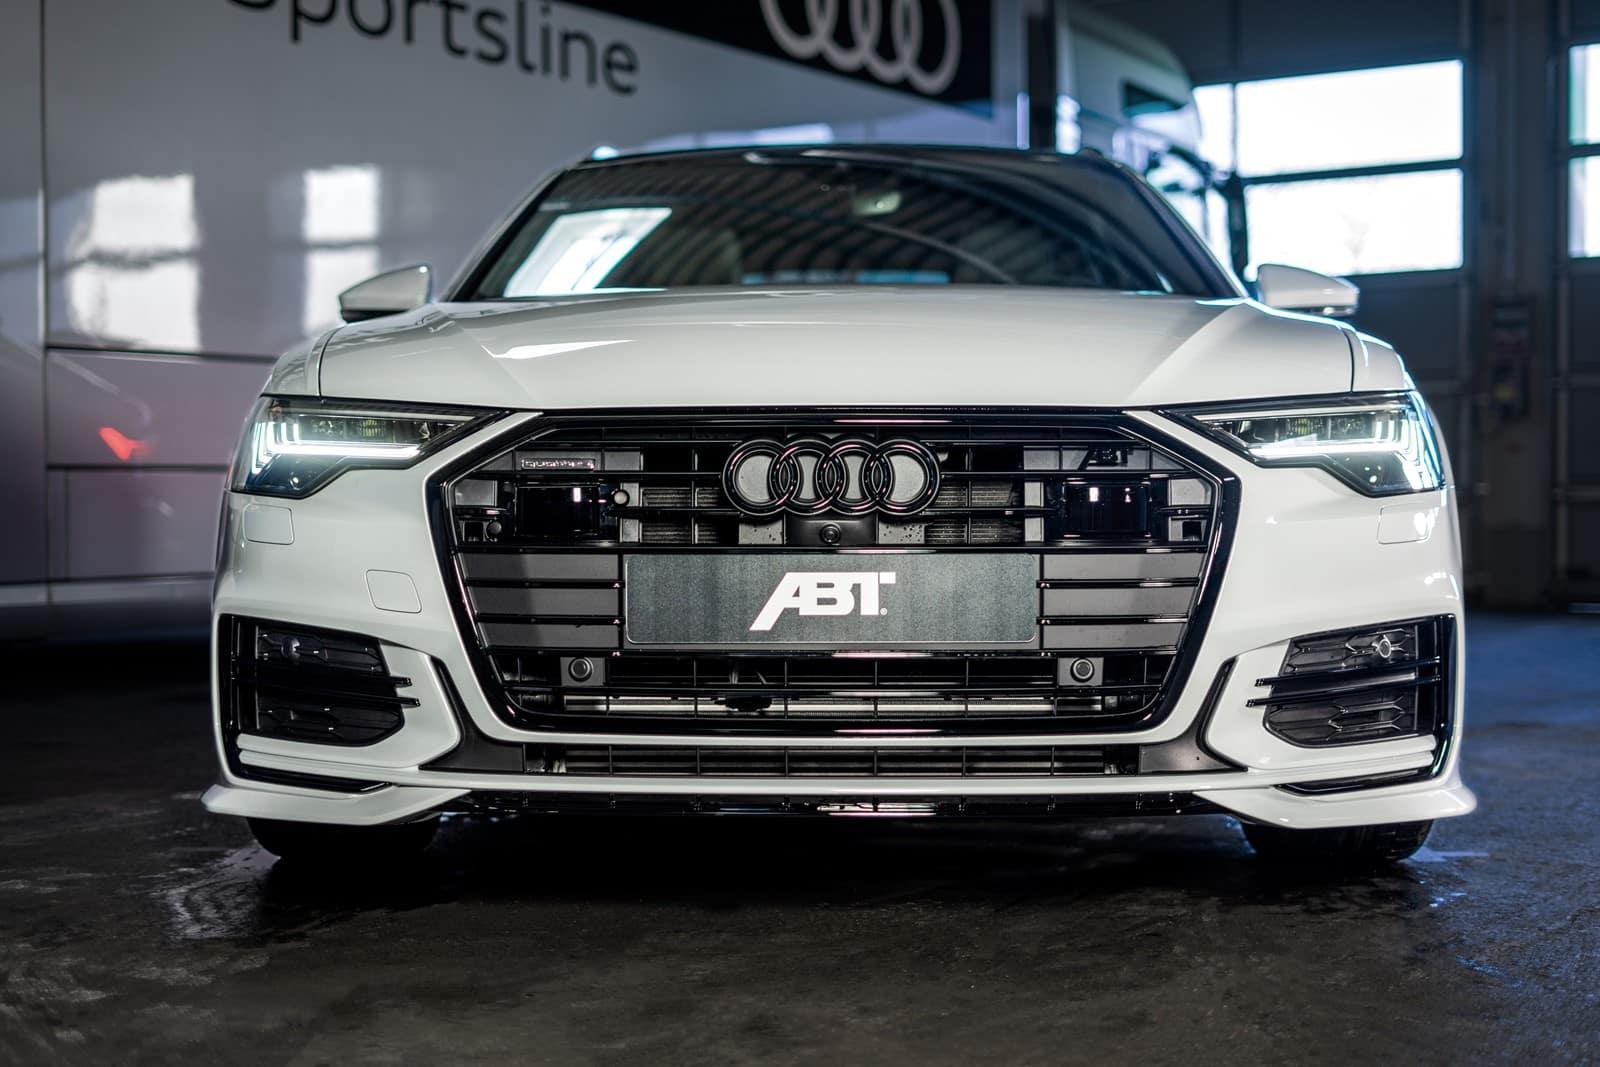 Audi-A6-Avant-ABT-aero-package-3.jpg